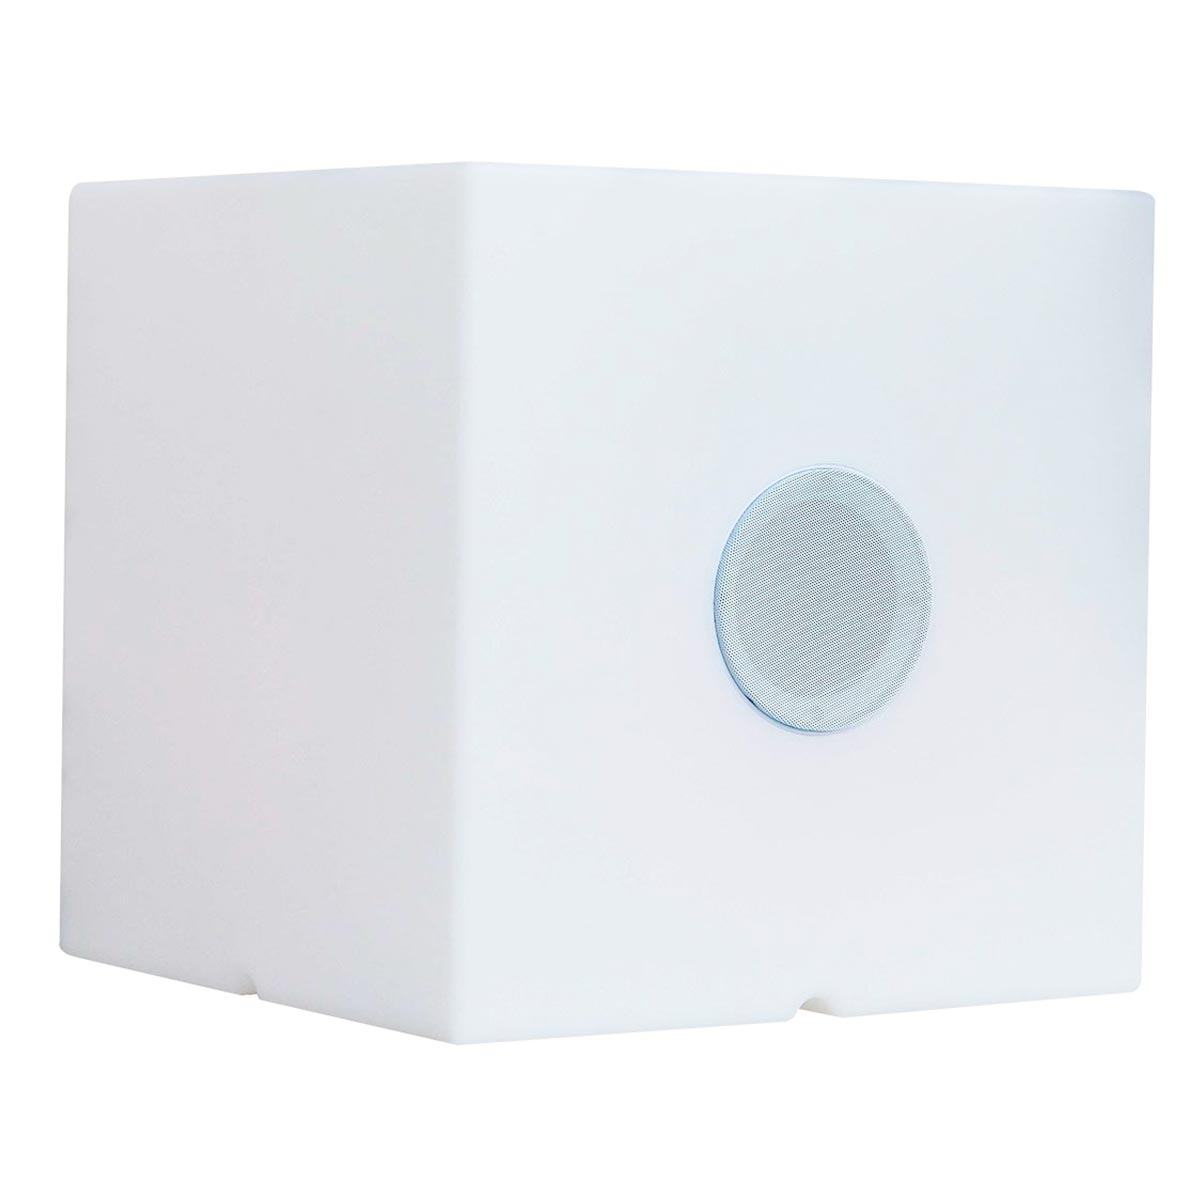 Cube enceinte bluetooth plastique blanc H40cm